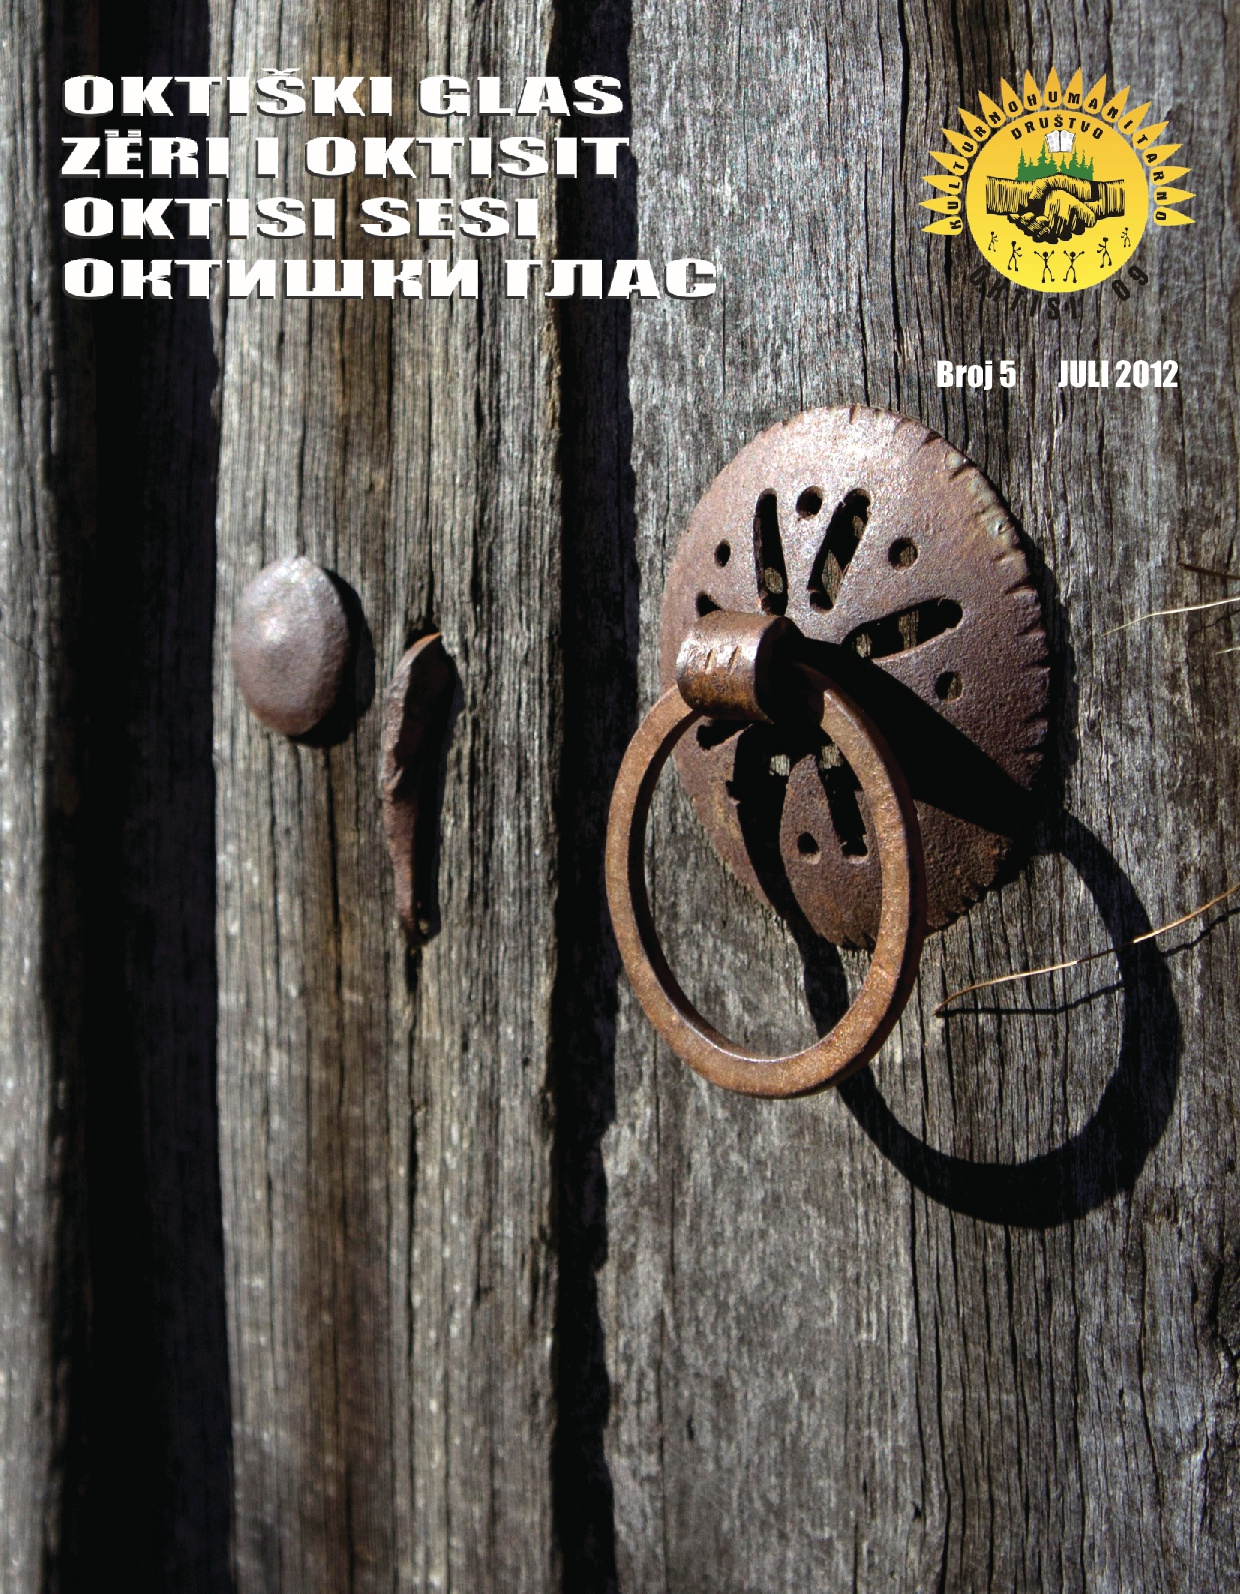 Oktiski Glas Br5 - Juli 2012